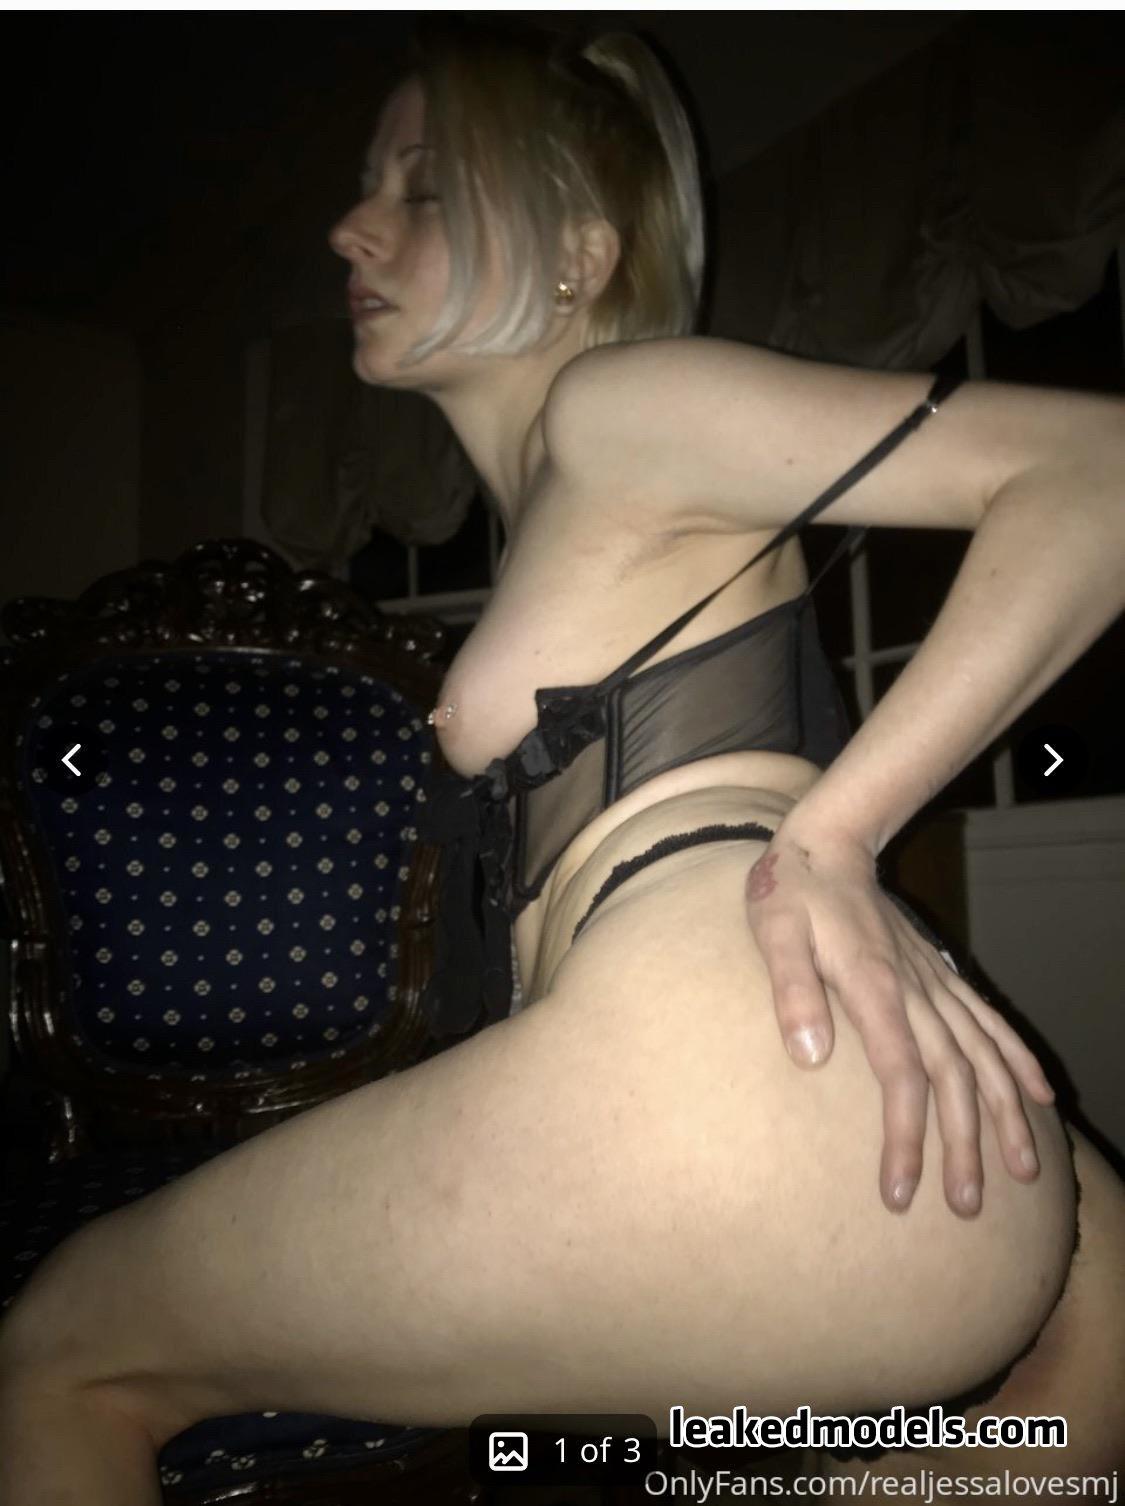 jessa furches   realjessalovesmj leaked nude leakedmodels.com 0011 - Jessa Furches – realjessalovesmj OnlyFans Nude Leaks (30 Photos)